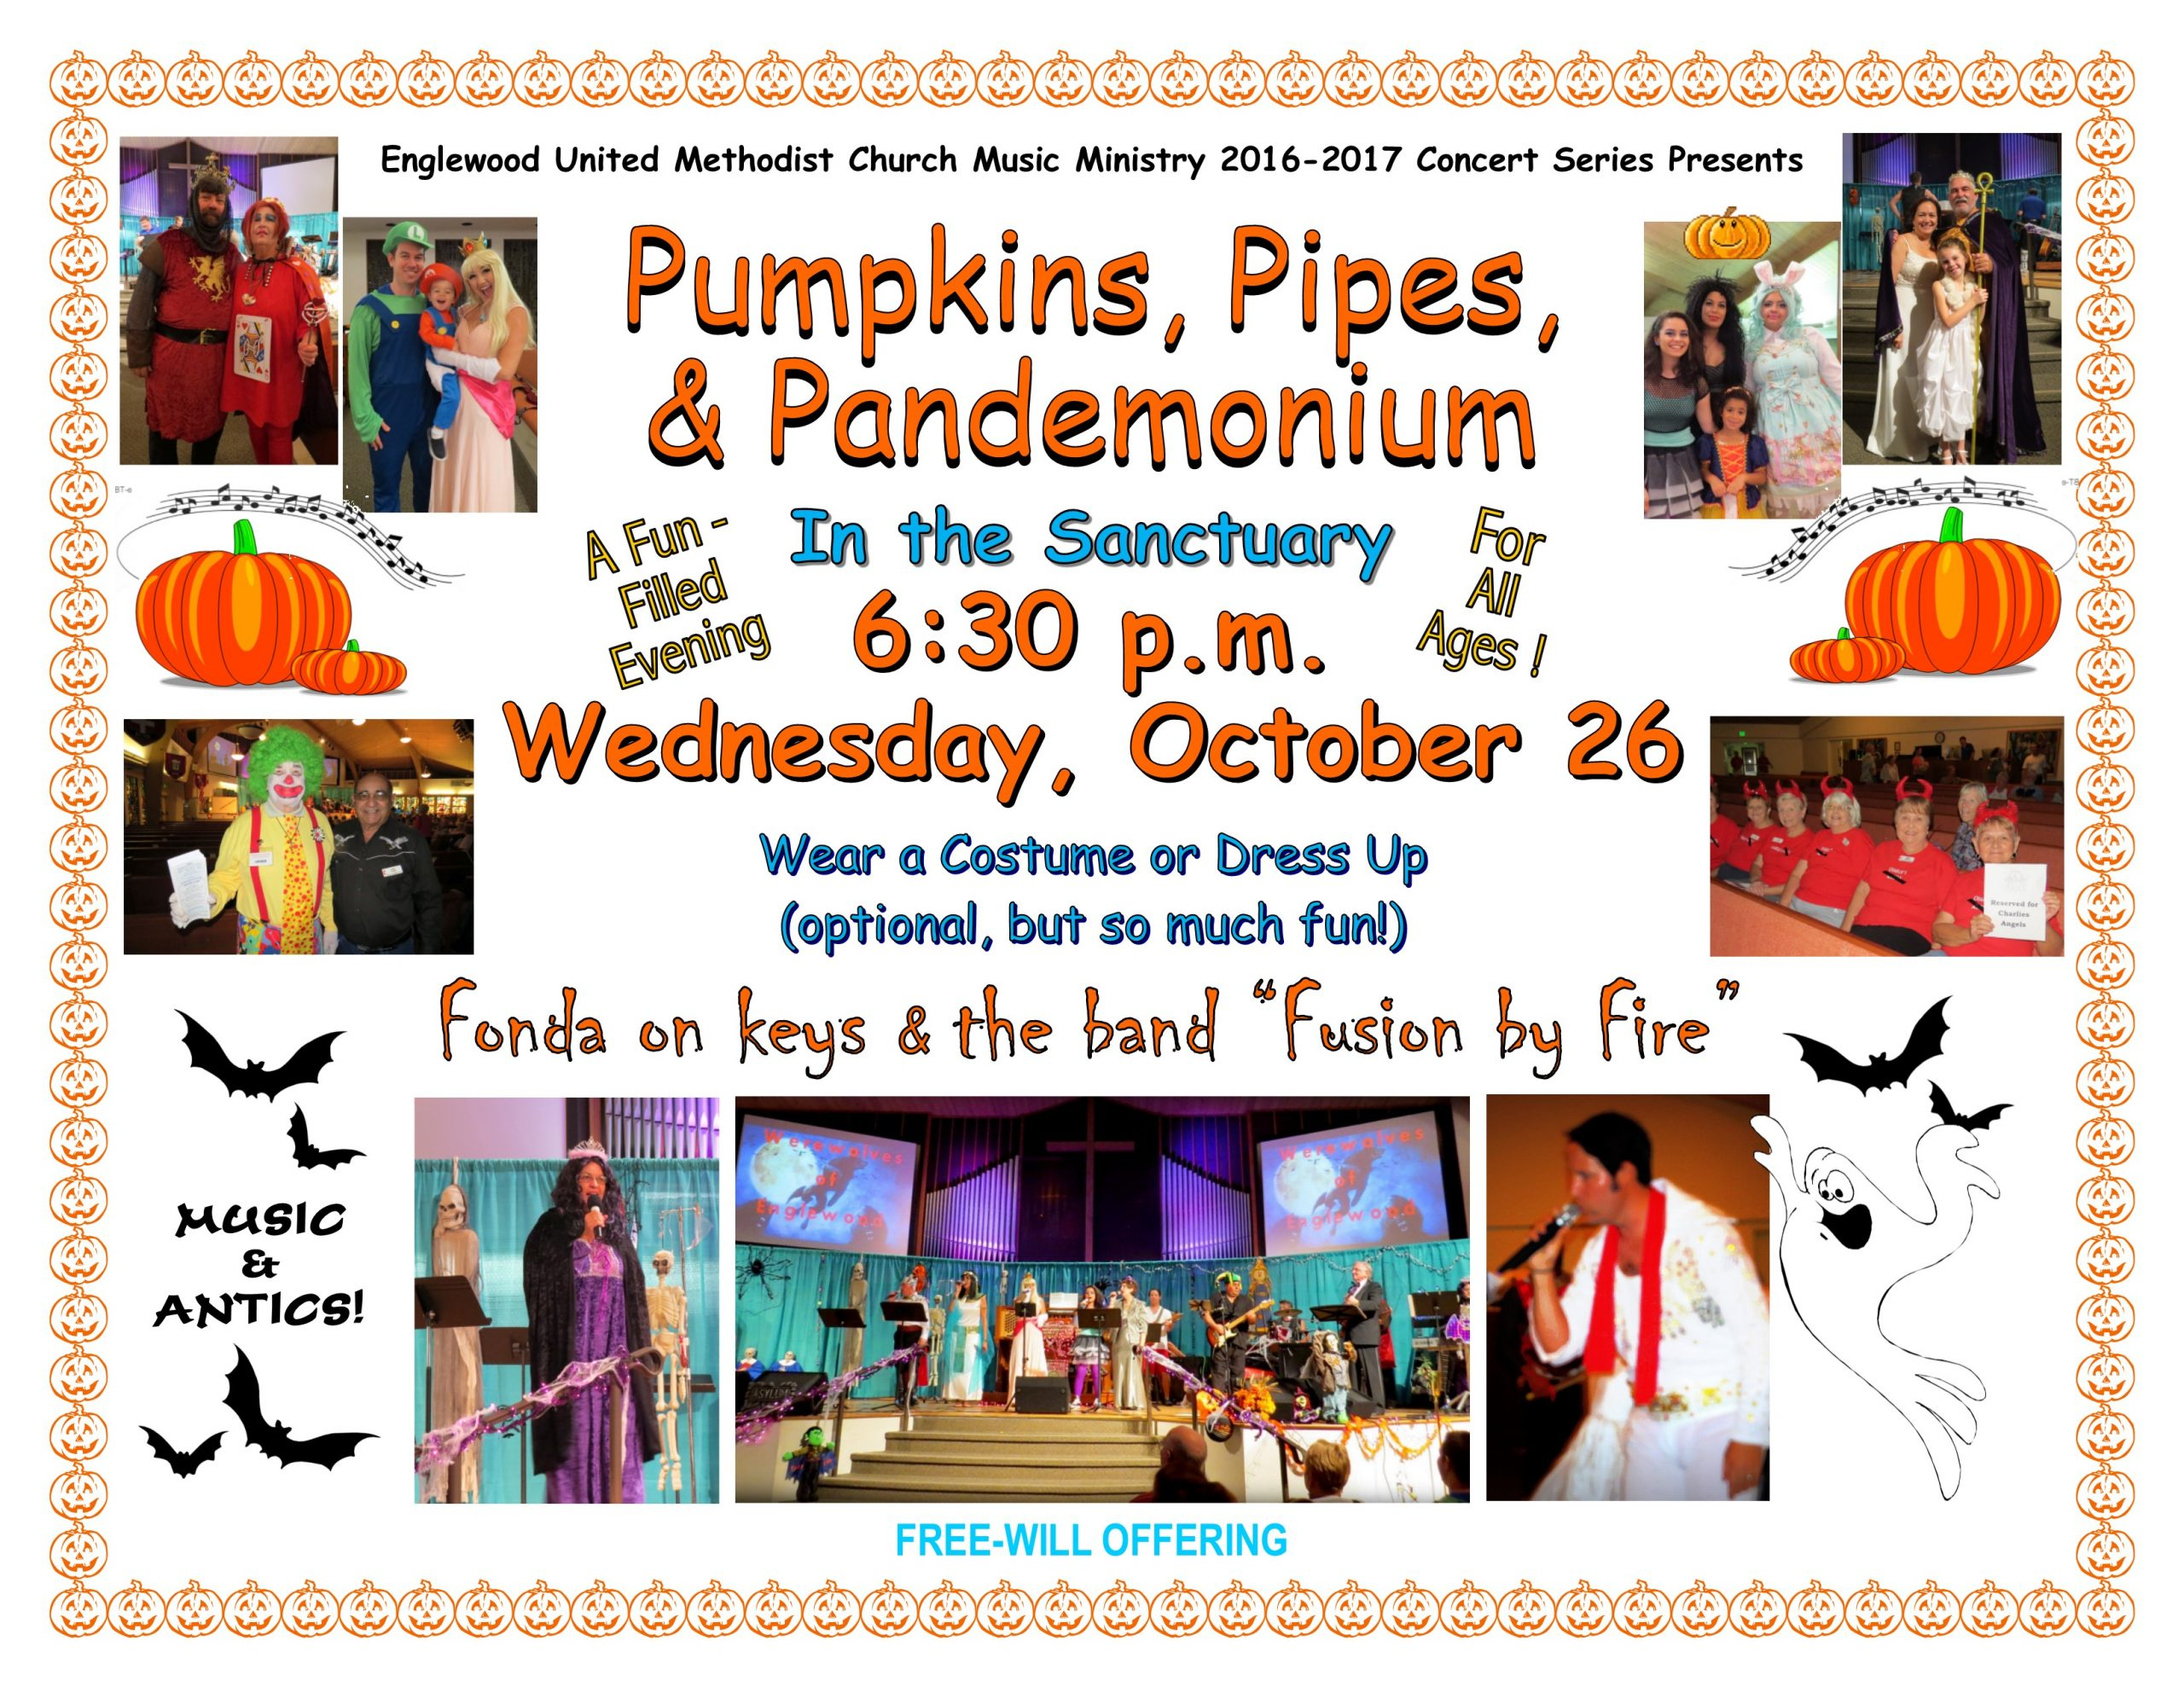 Pumpkins, Pipes, & Pandemonium